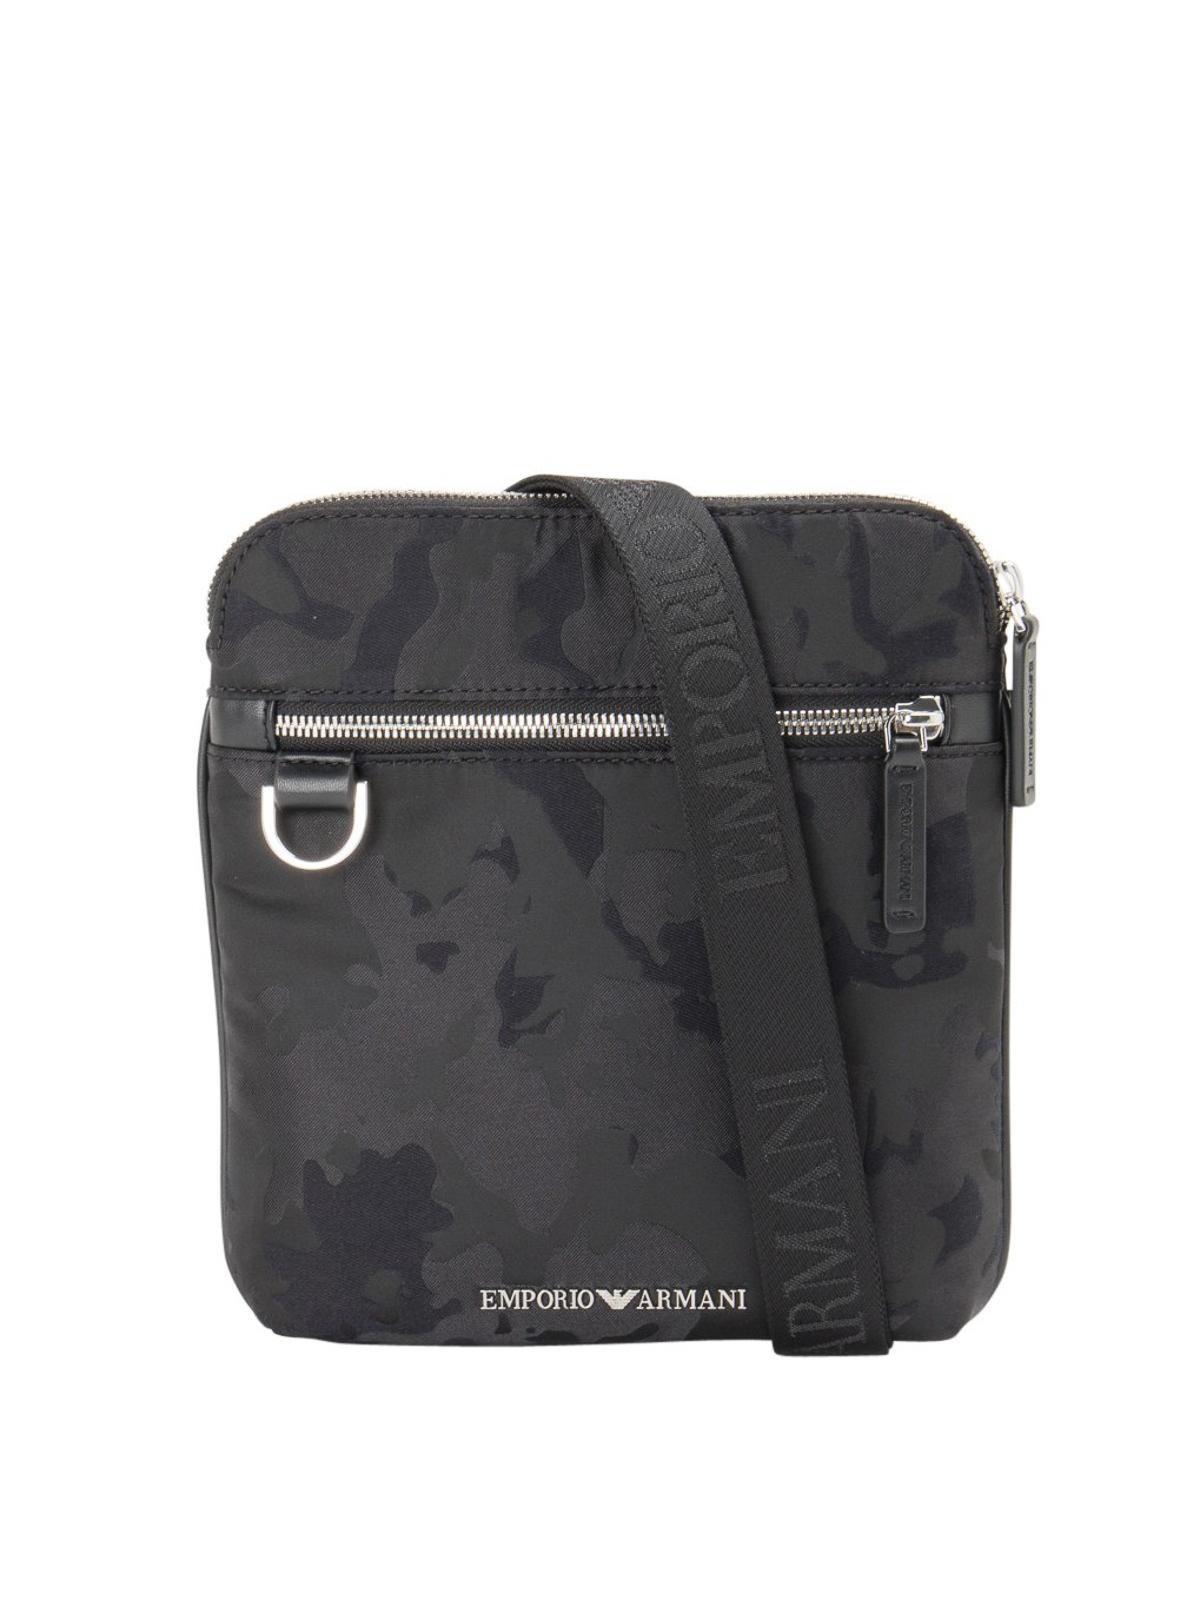 Emporio Armani Messengers CAMOUFLAGE SHOULDER BAG